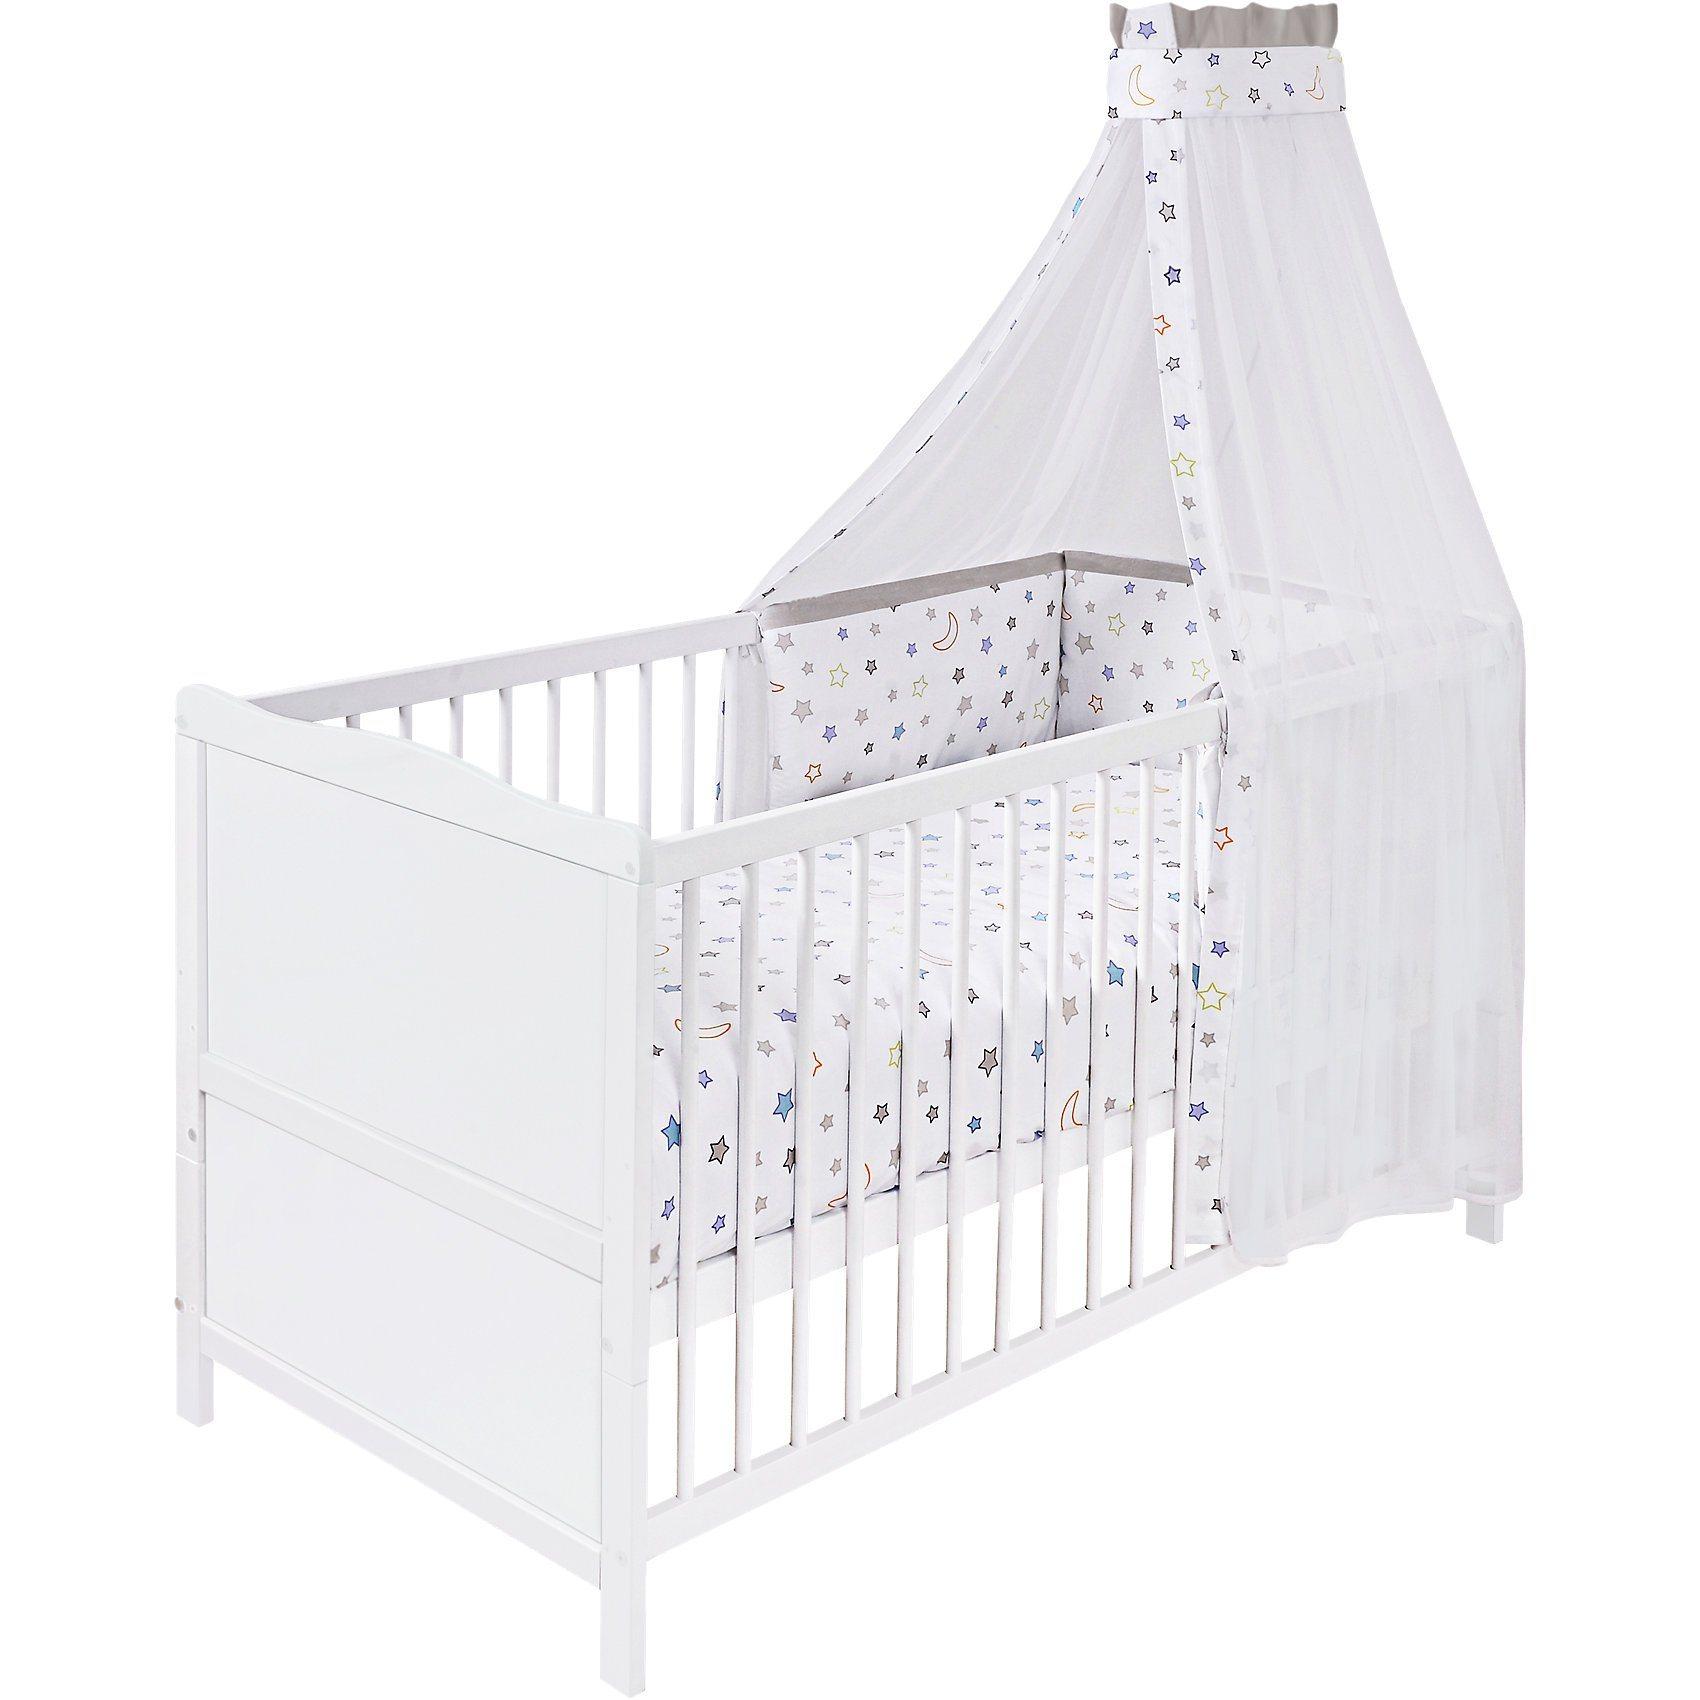 Kinderbetten online kaufen  Möbel-Suchmaschine  ladendirekt.de